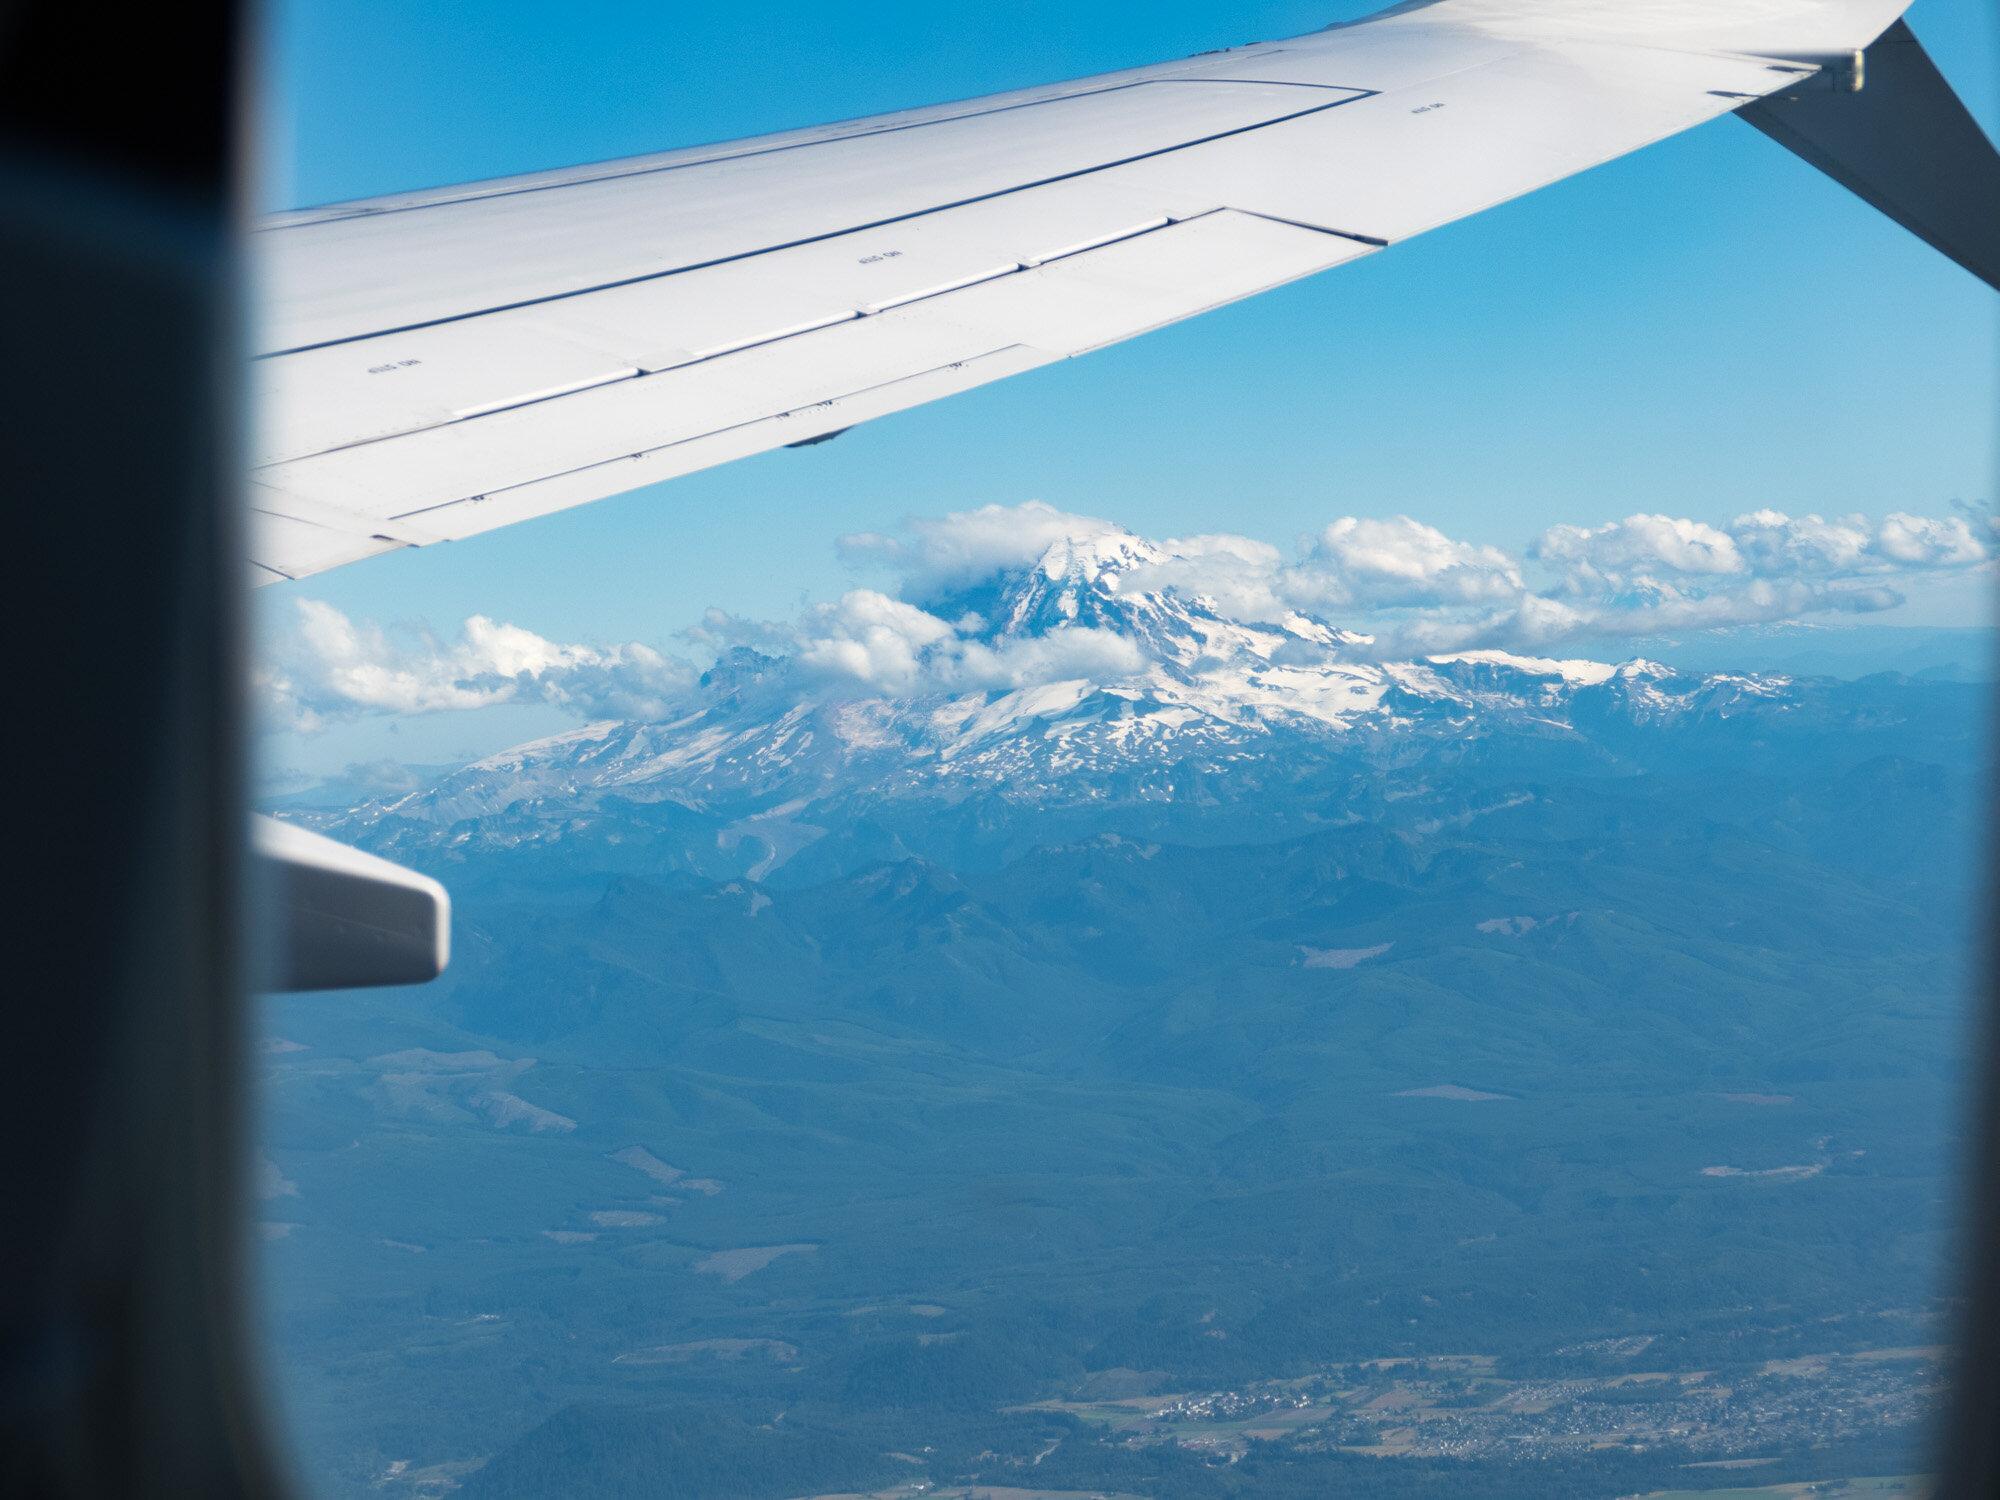 Bidding Mt. Ranier adieu from the airplane